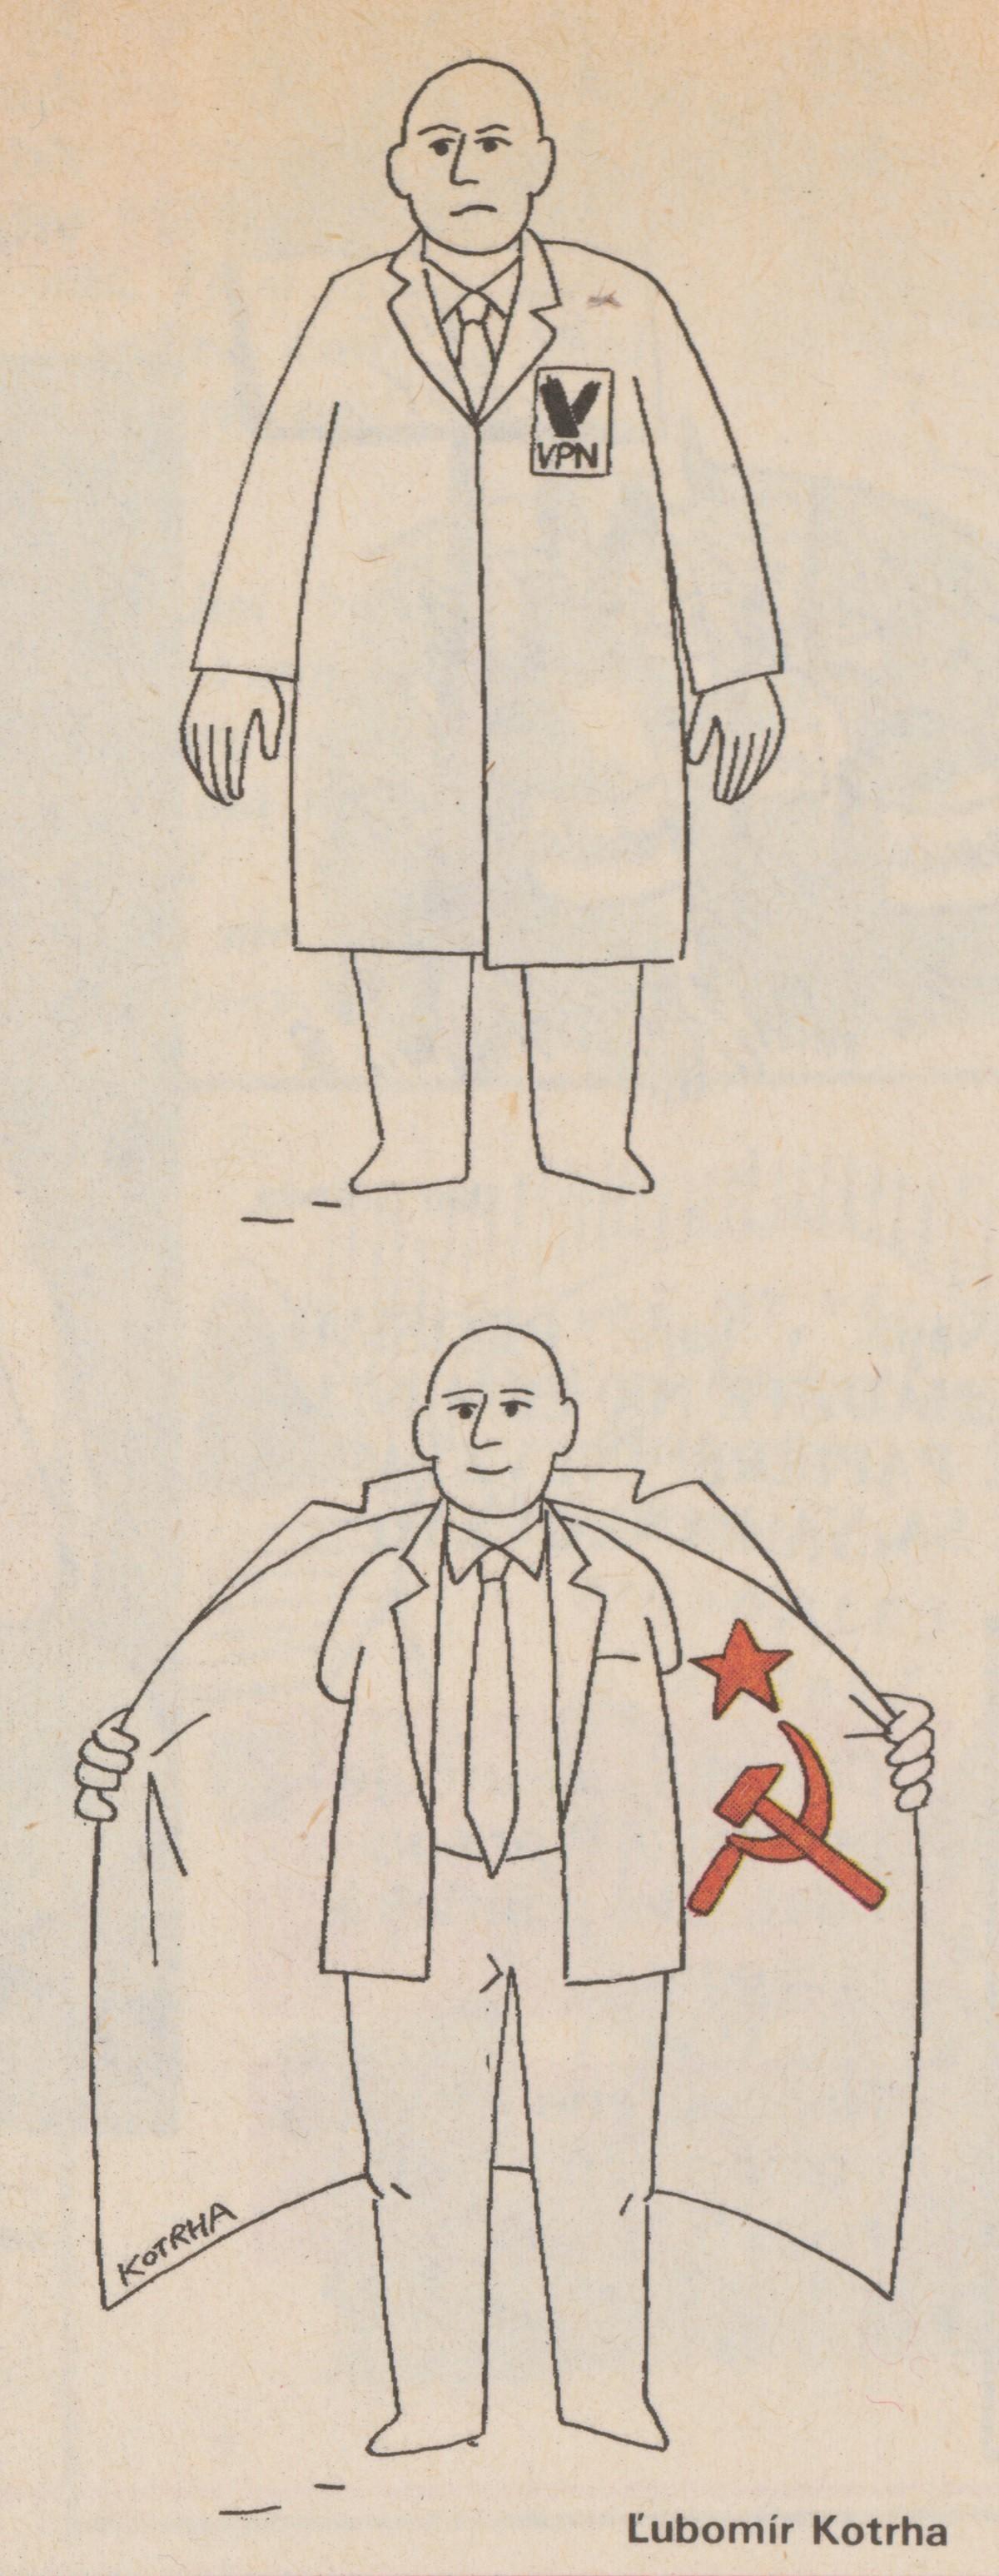 Ľubomír Kotrha, Prevracač. 1990. Časopis Roháč